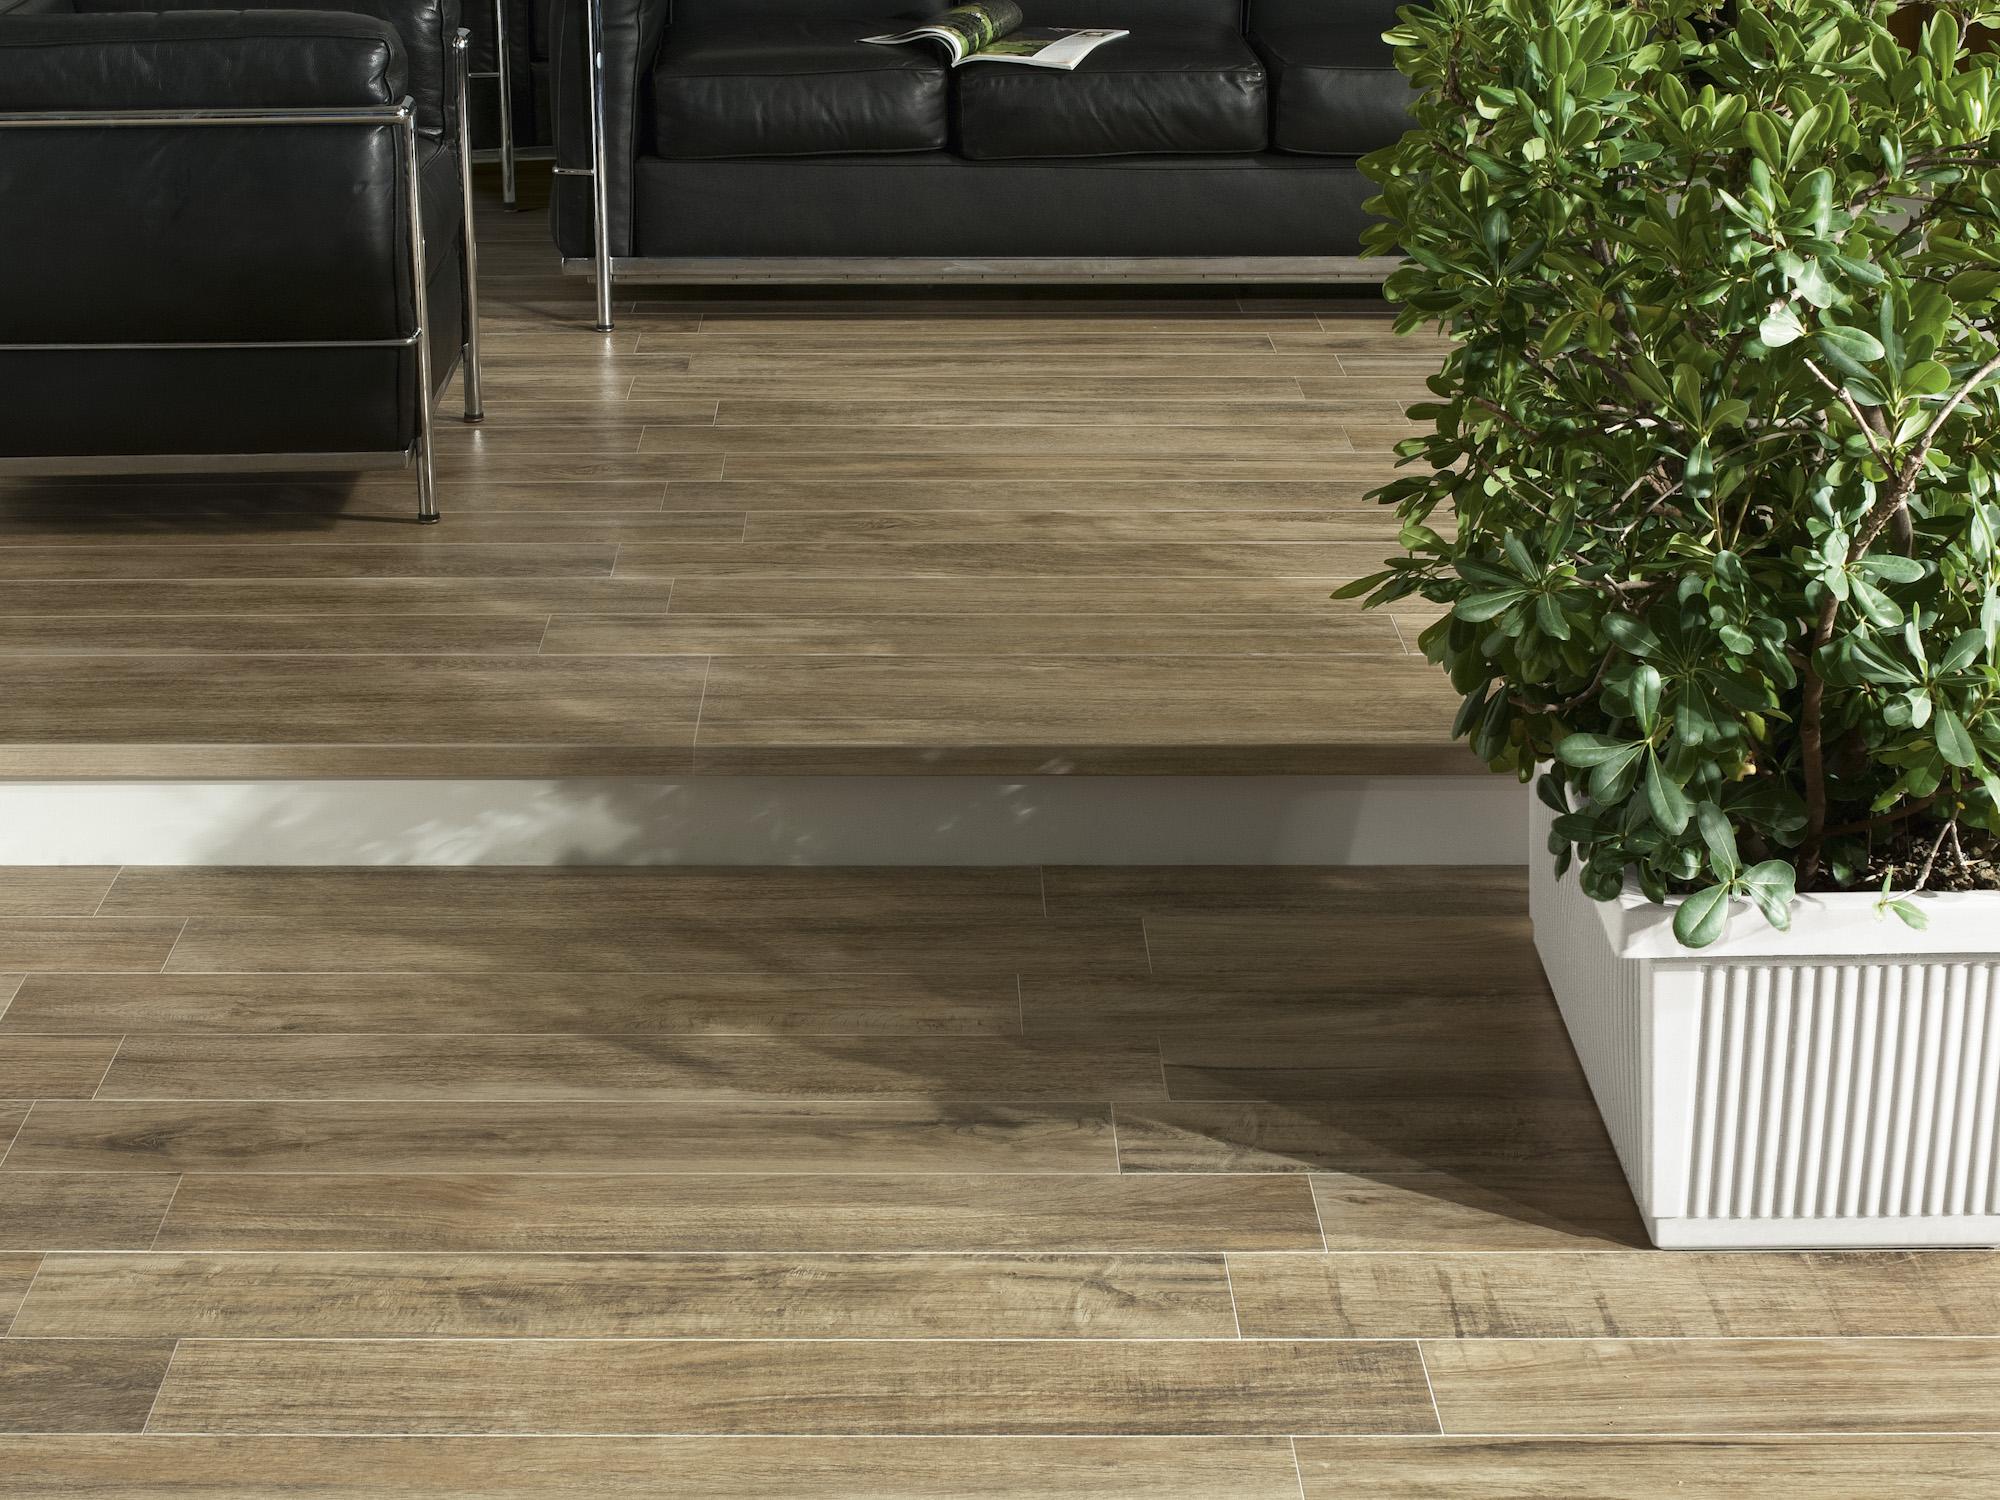 focus_pavimento legno